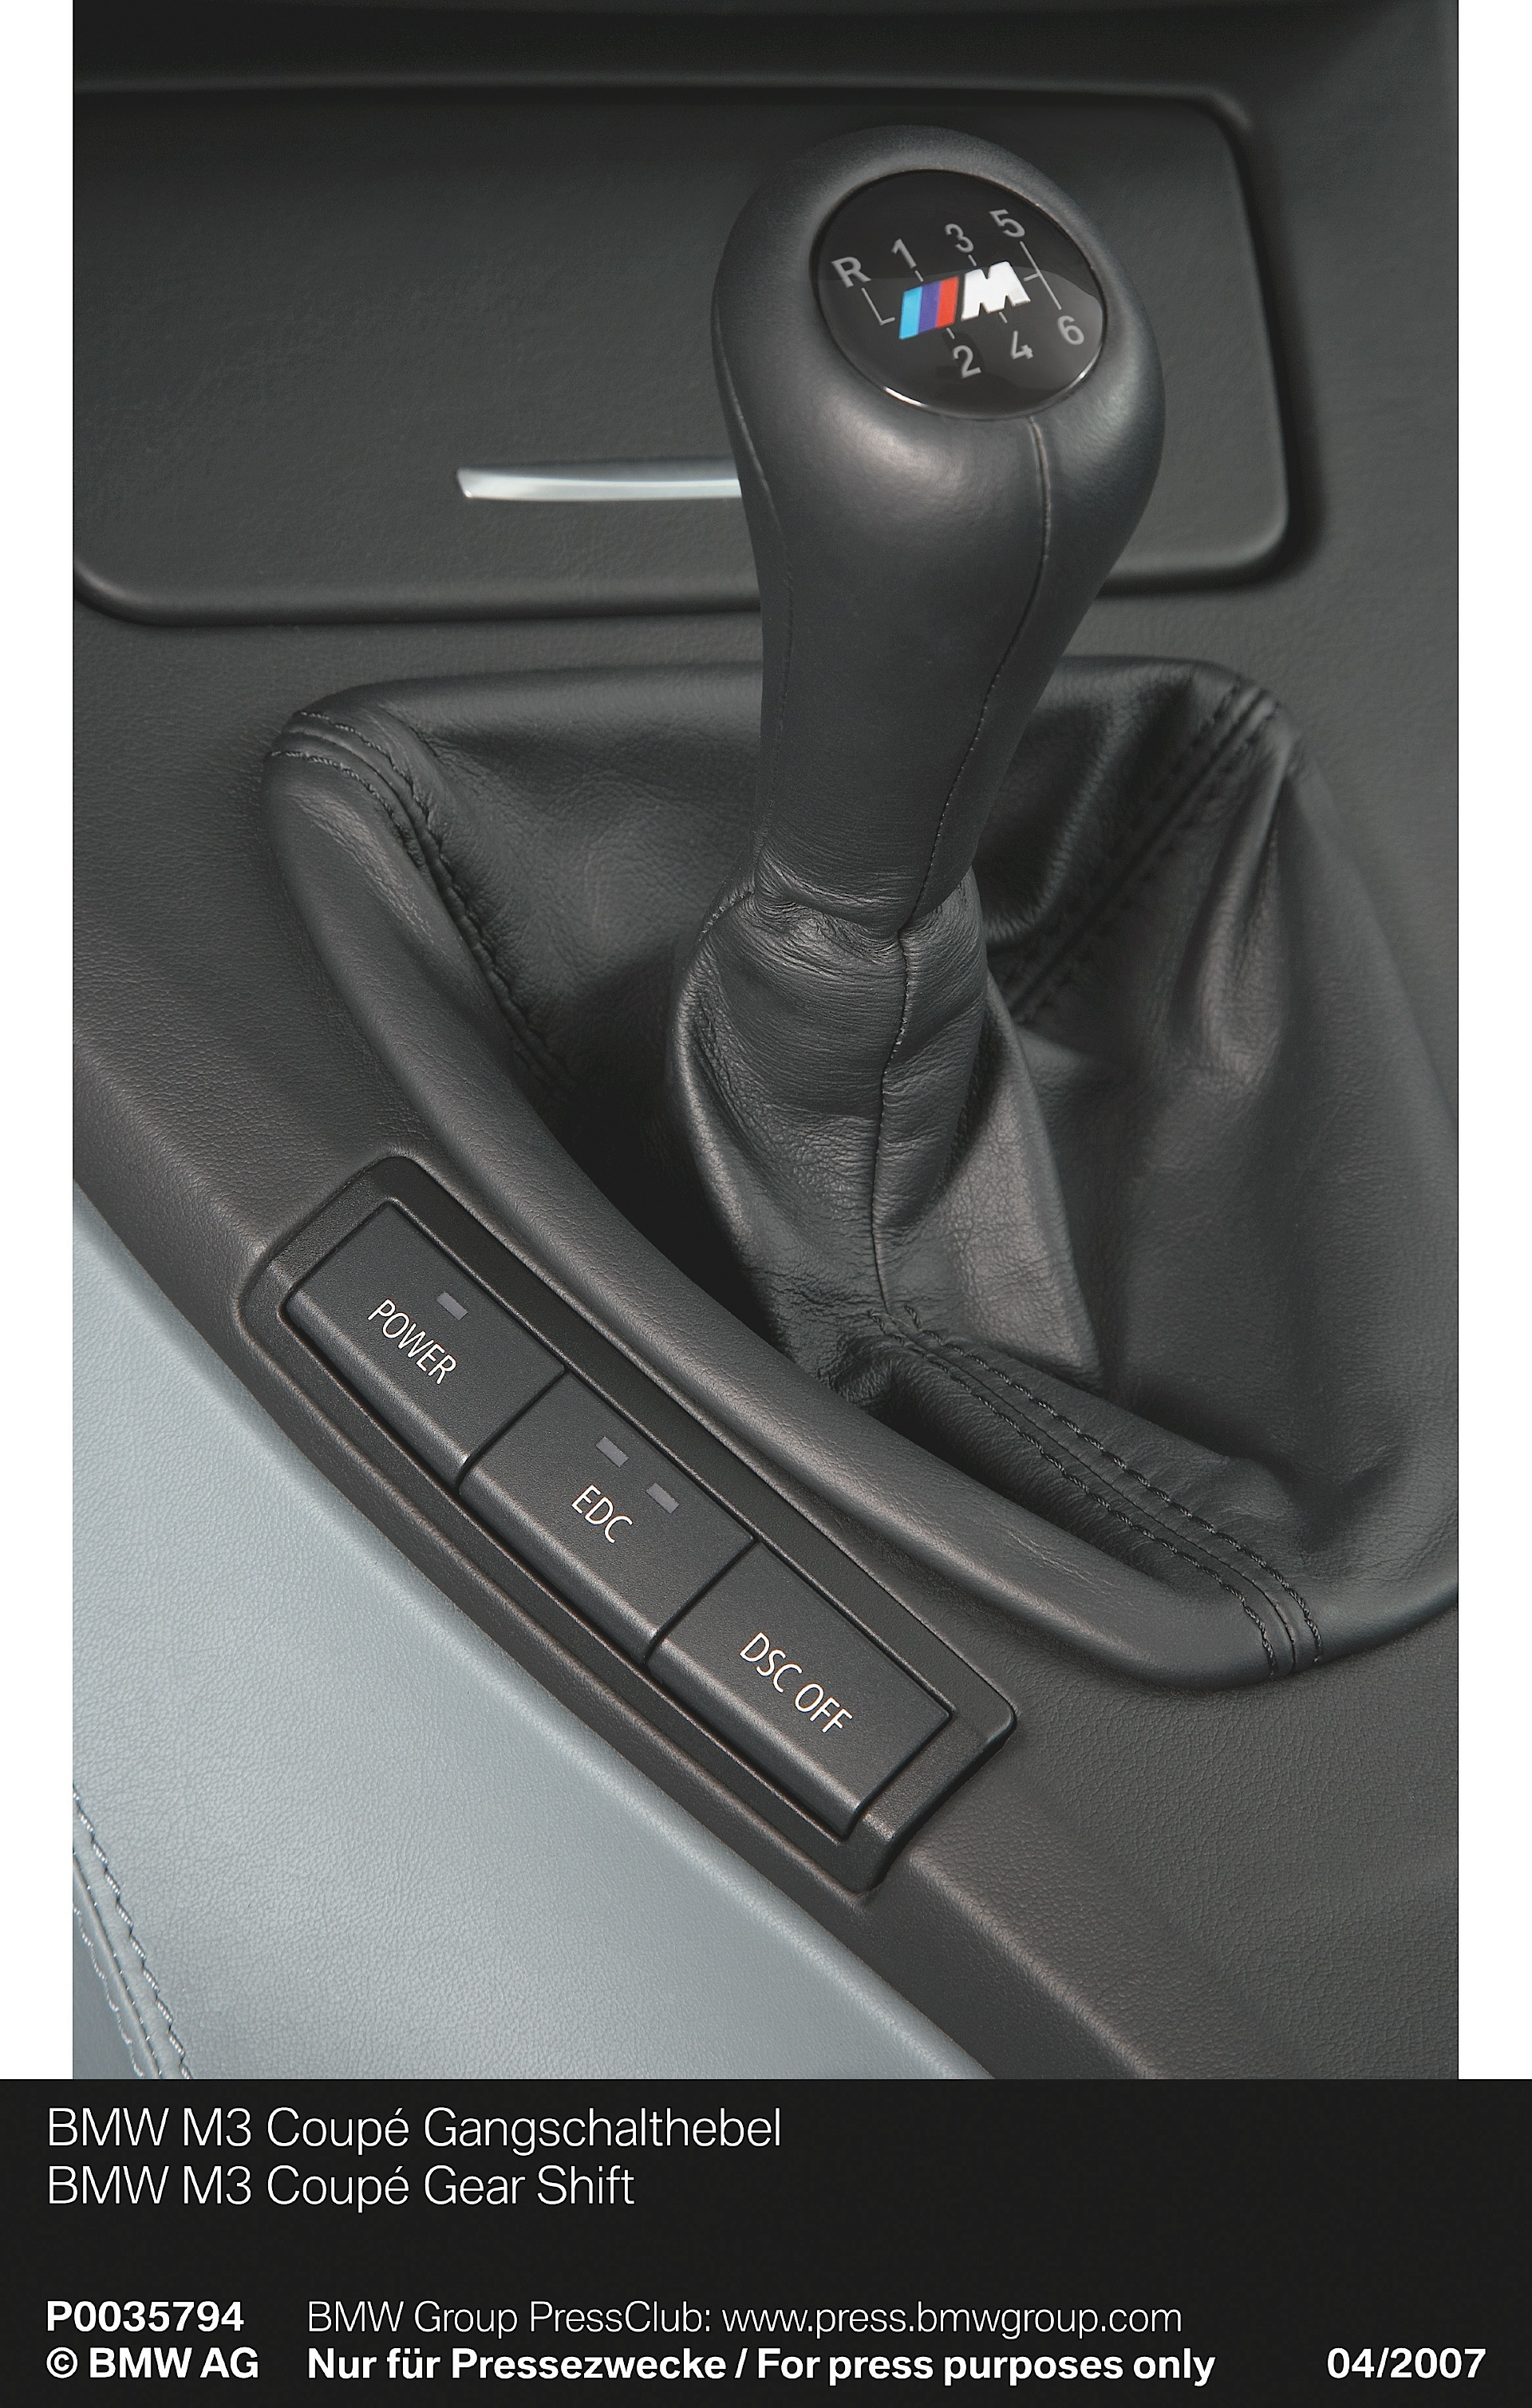 bmw m3 coupe e92 2007 2011 - M3 Bmw 2007